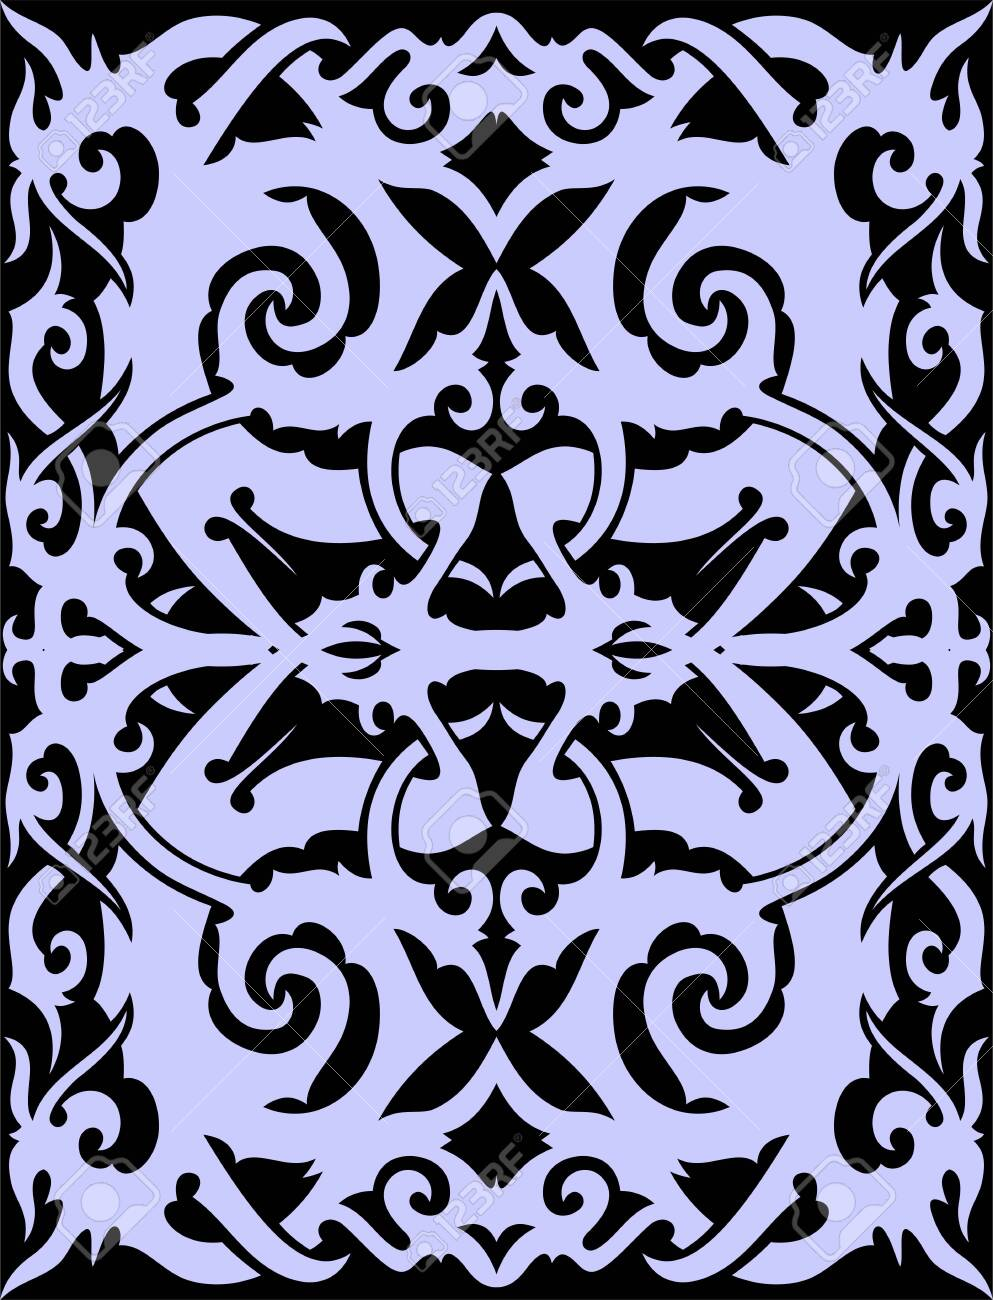 Vector Motif Batik : vector, motif, batik, Borneo, Dayak, Batik, Pattern.simple, Geometric, Pattern., Motif, Background.Stylish.., Royalty, Cliparts,, Vectors,, Stock, Illustration., Image, 127849179.